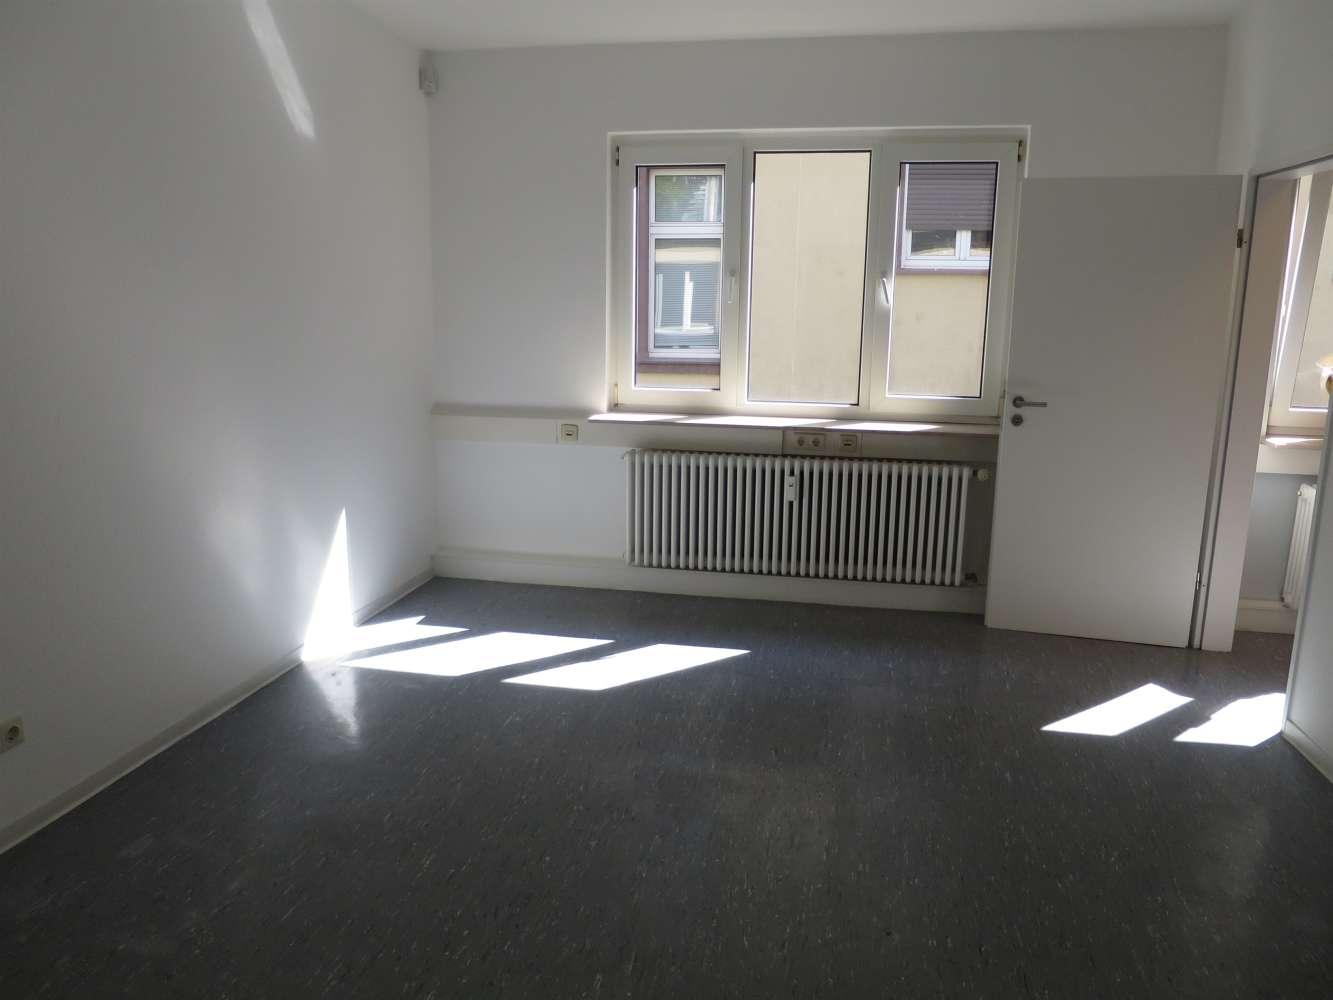 Büros Frankfurt am main, 60318 - Büro - Frankfurt am Main - F2425 - 10611545